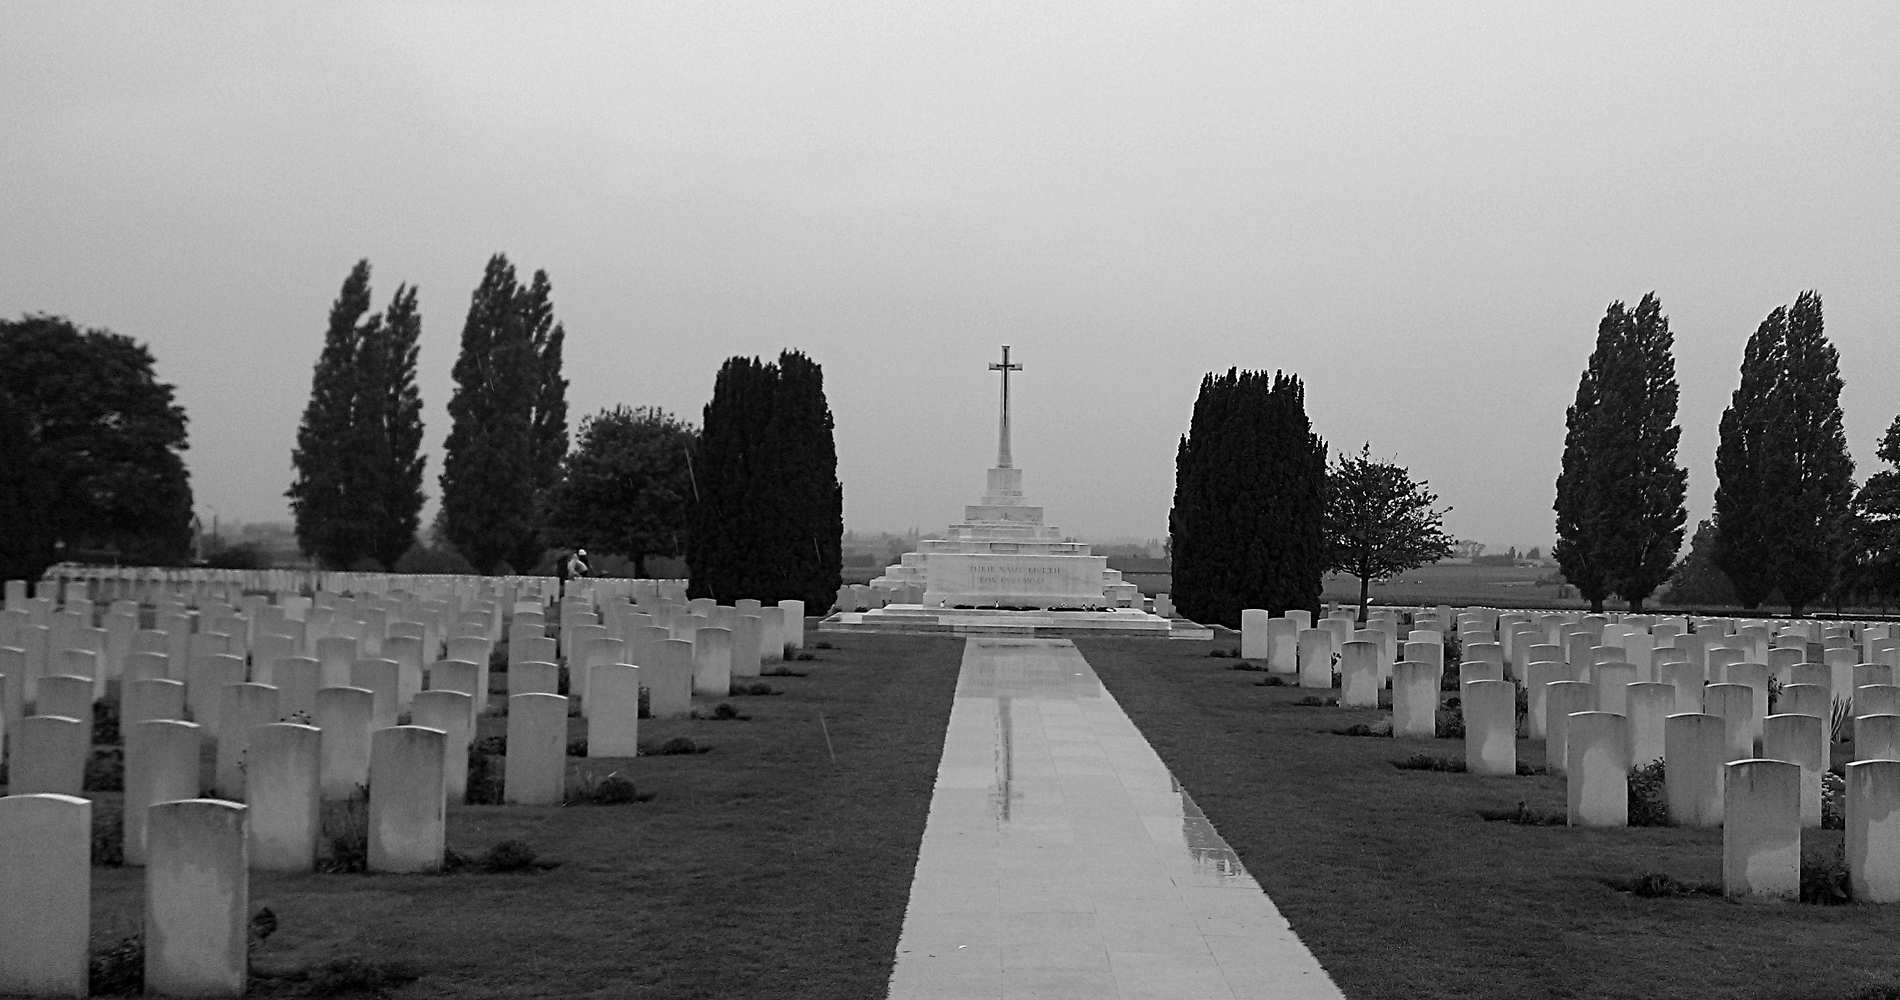 Der Tyne Cot Friedhof in Flandern - Mahnmal des 1. Weltkrieges